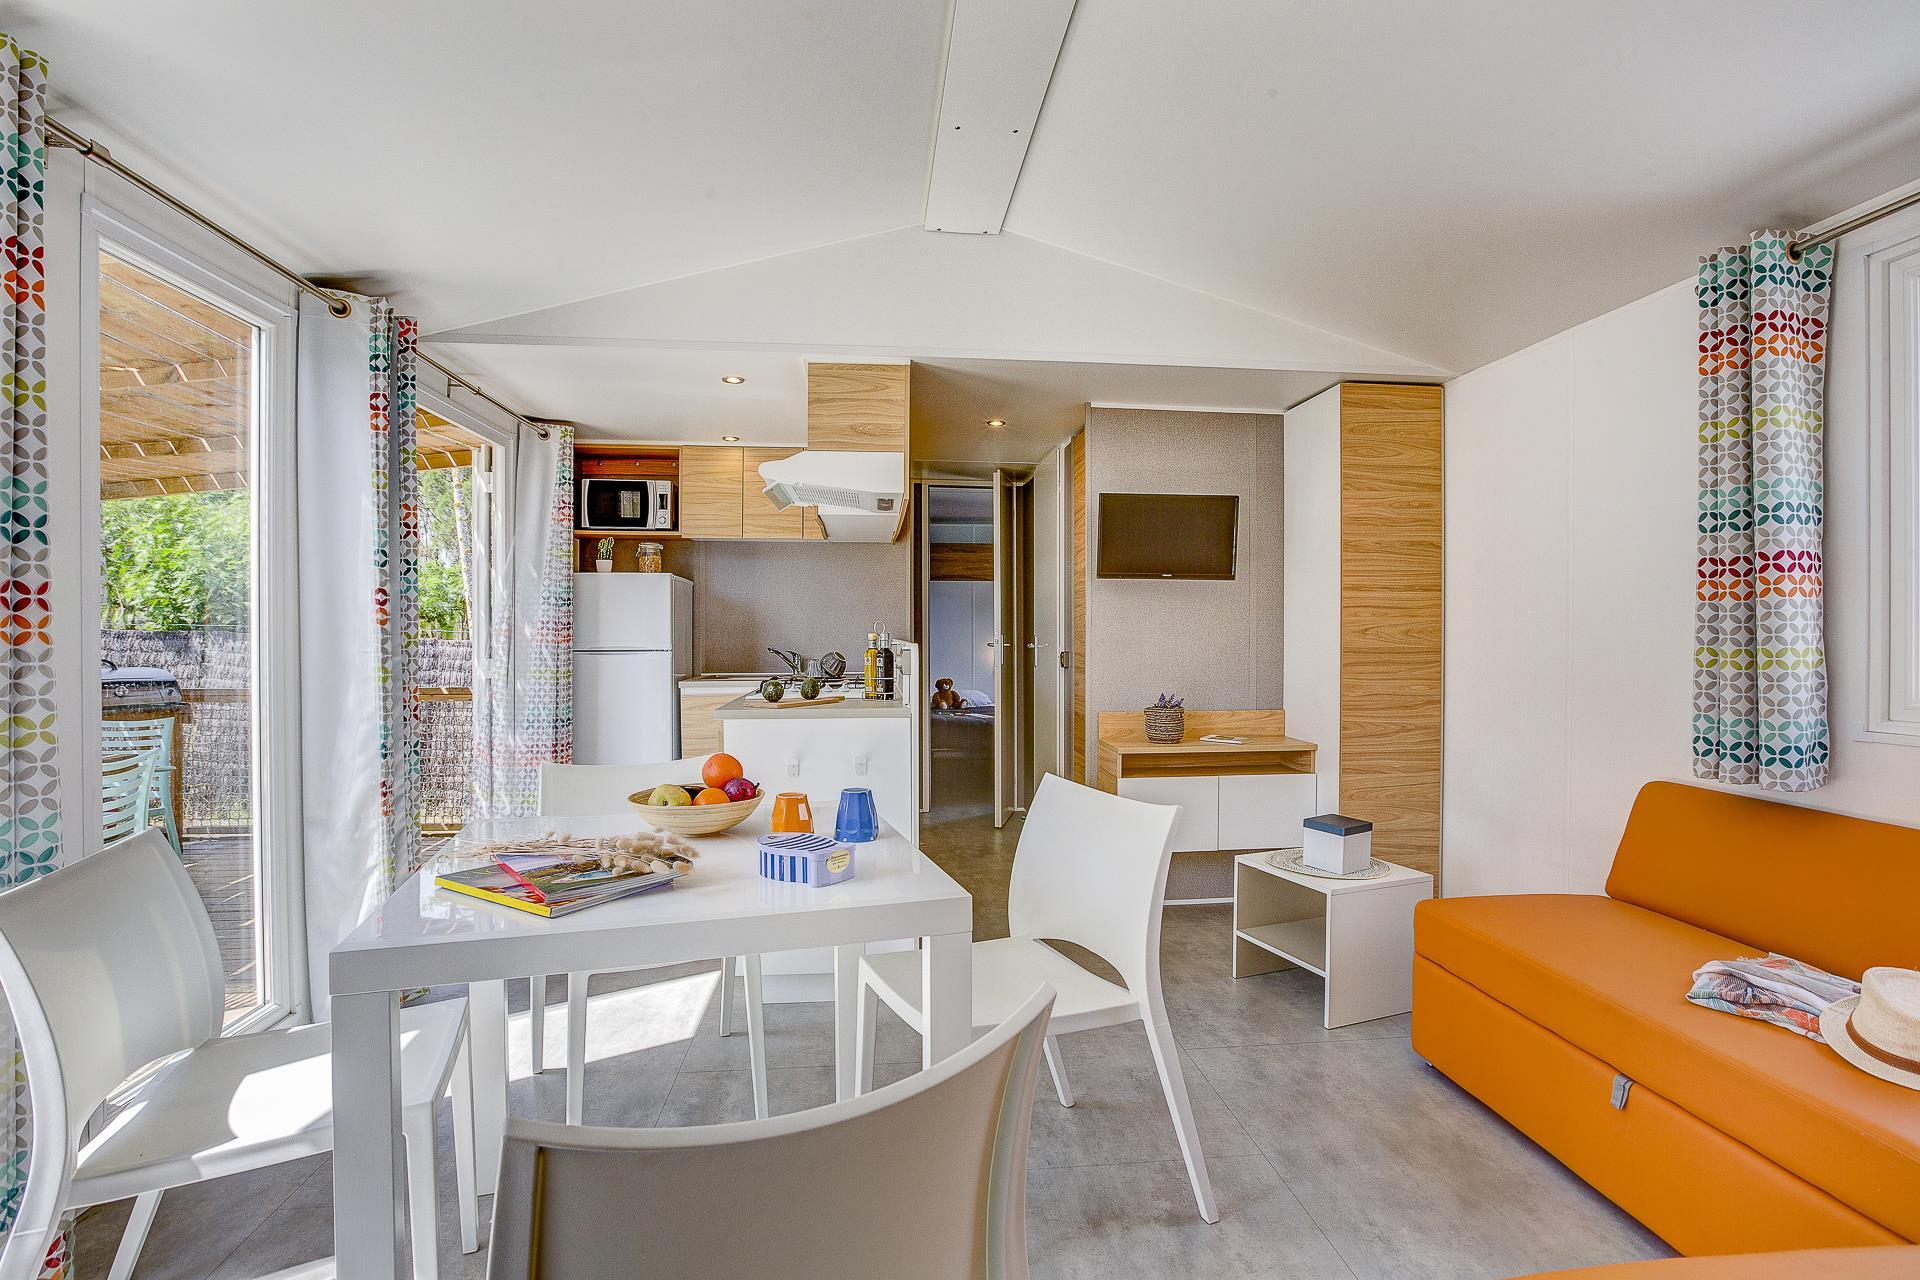 Location - Cottage Eden Family 3 Chambres 2 Salles De Bain Climatisé Premium - Camping Sandaya Blue Bayou